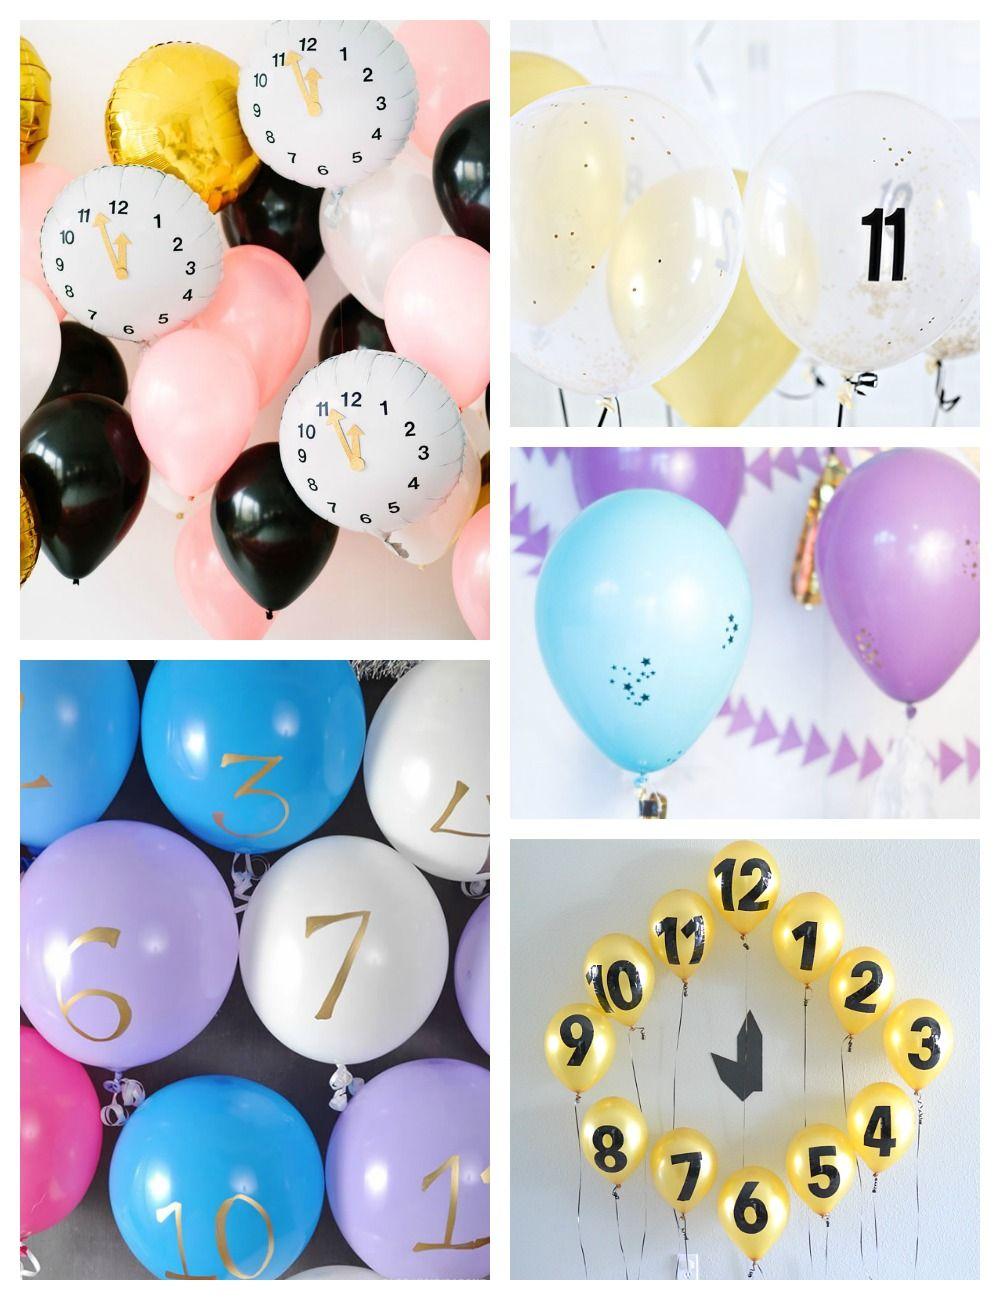 New Year's Eve Balloon Countdown Clock Countdown clock